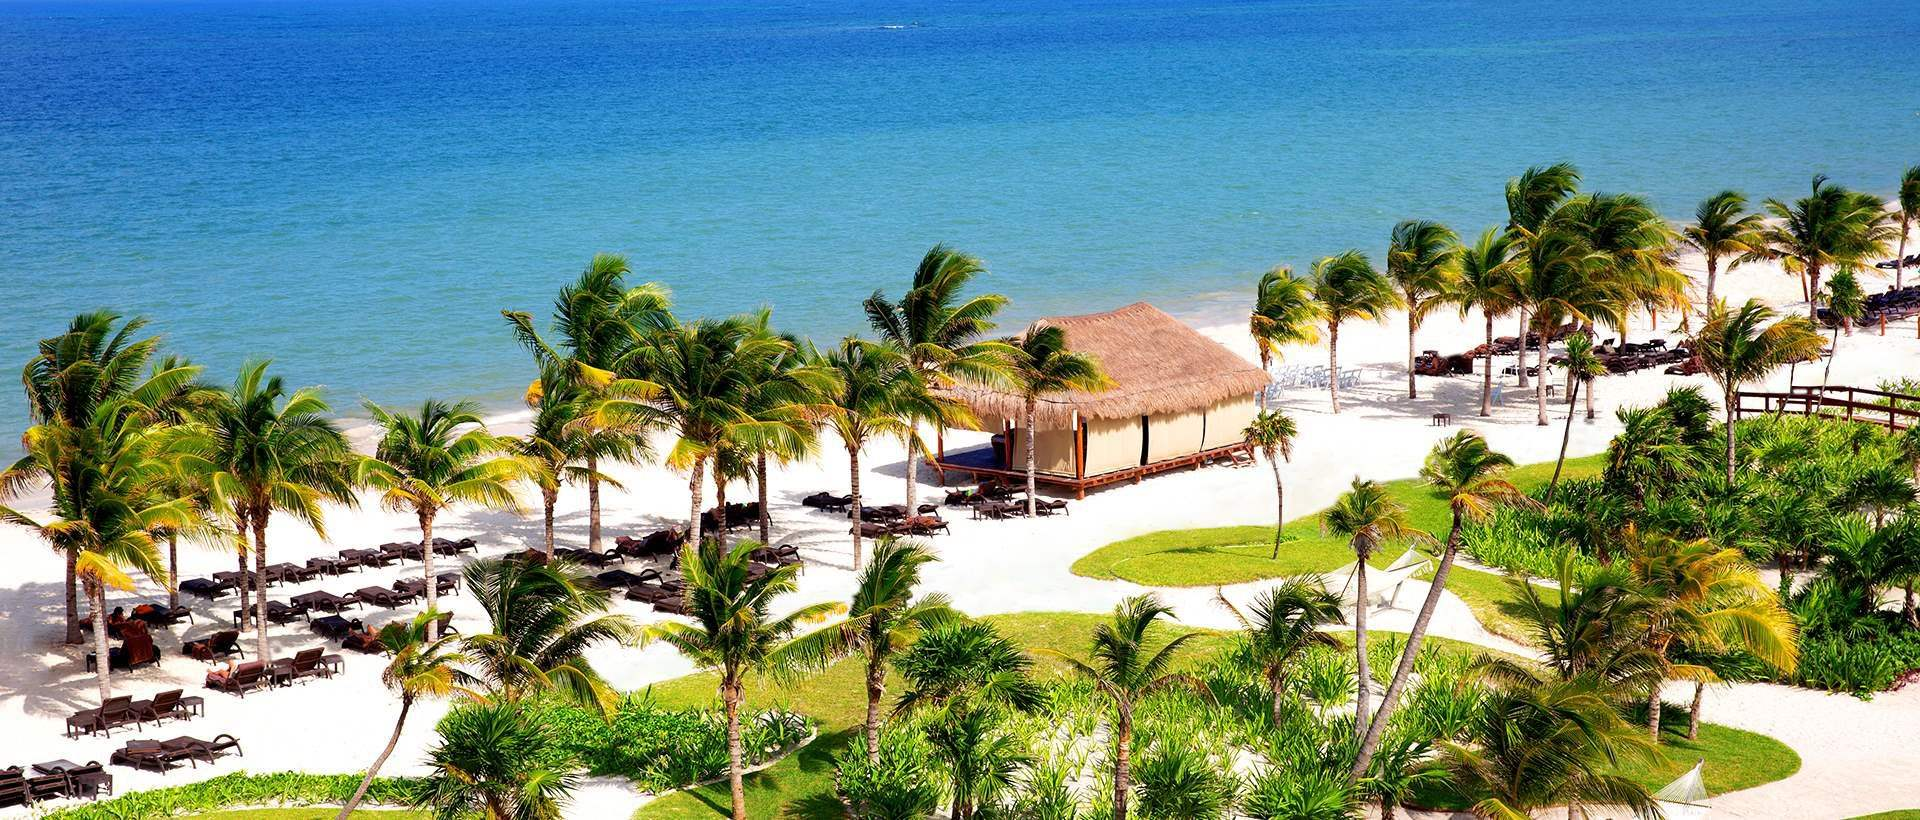 Royalton Riviera Cancun, An Autograph Collection All-Inclusive Resort & Casino